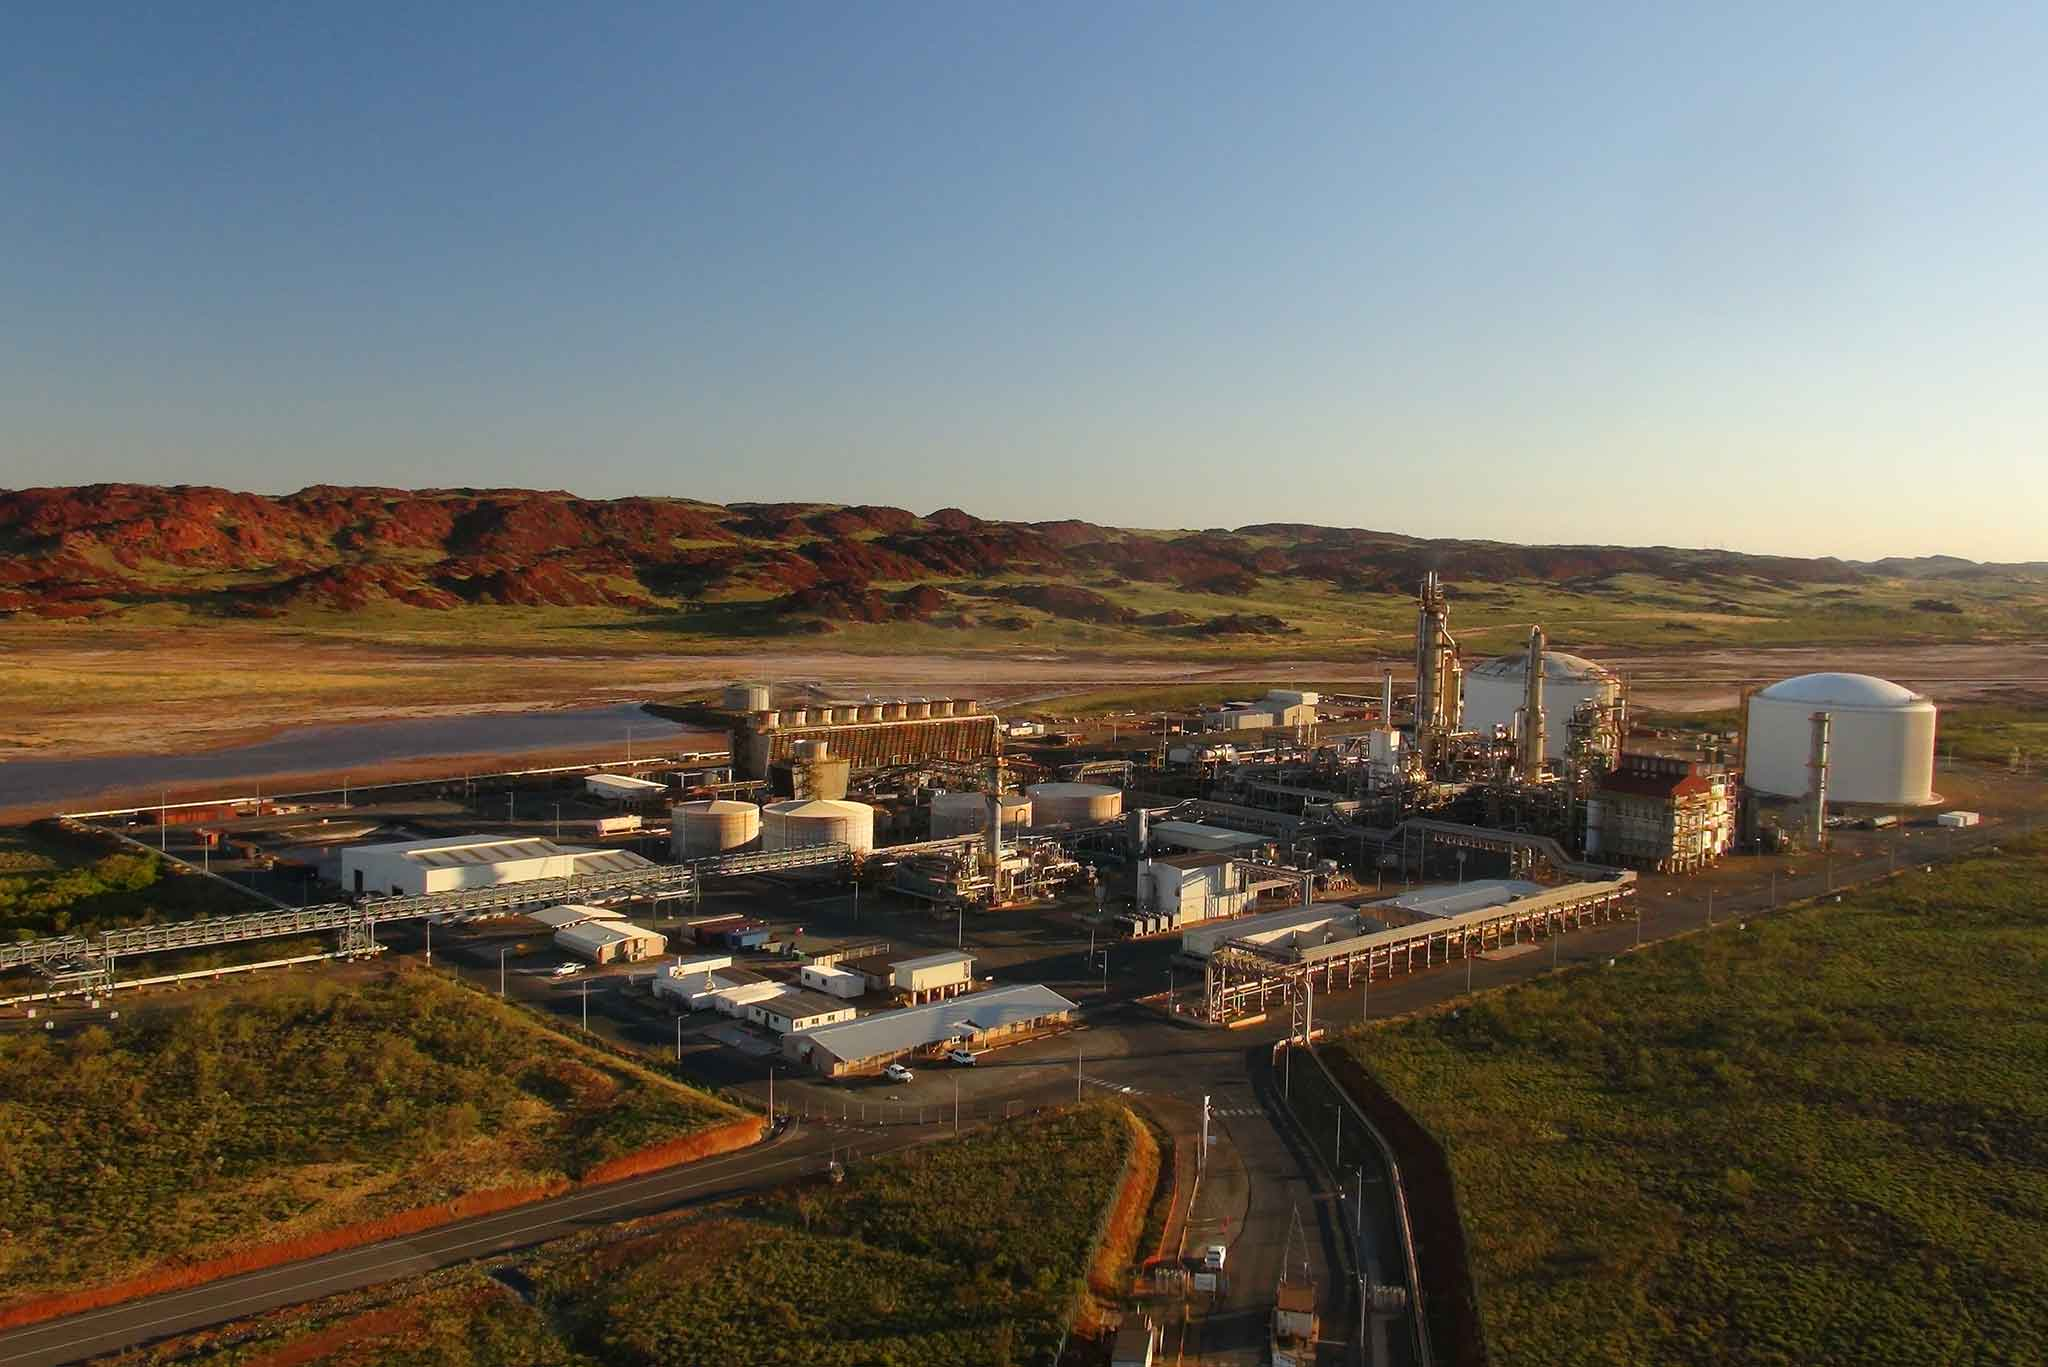 Image - Yara Pilbara Renewable Ammonia plant